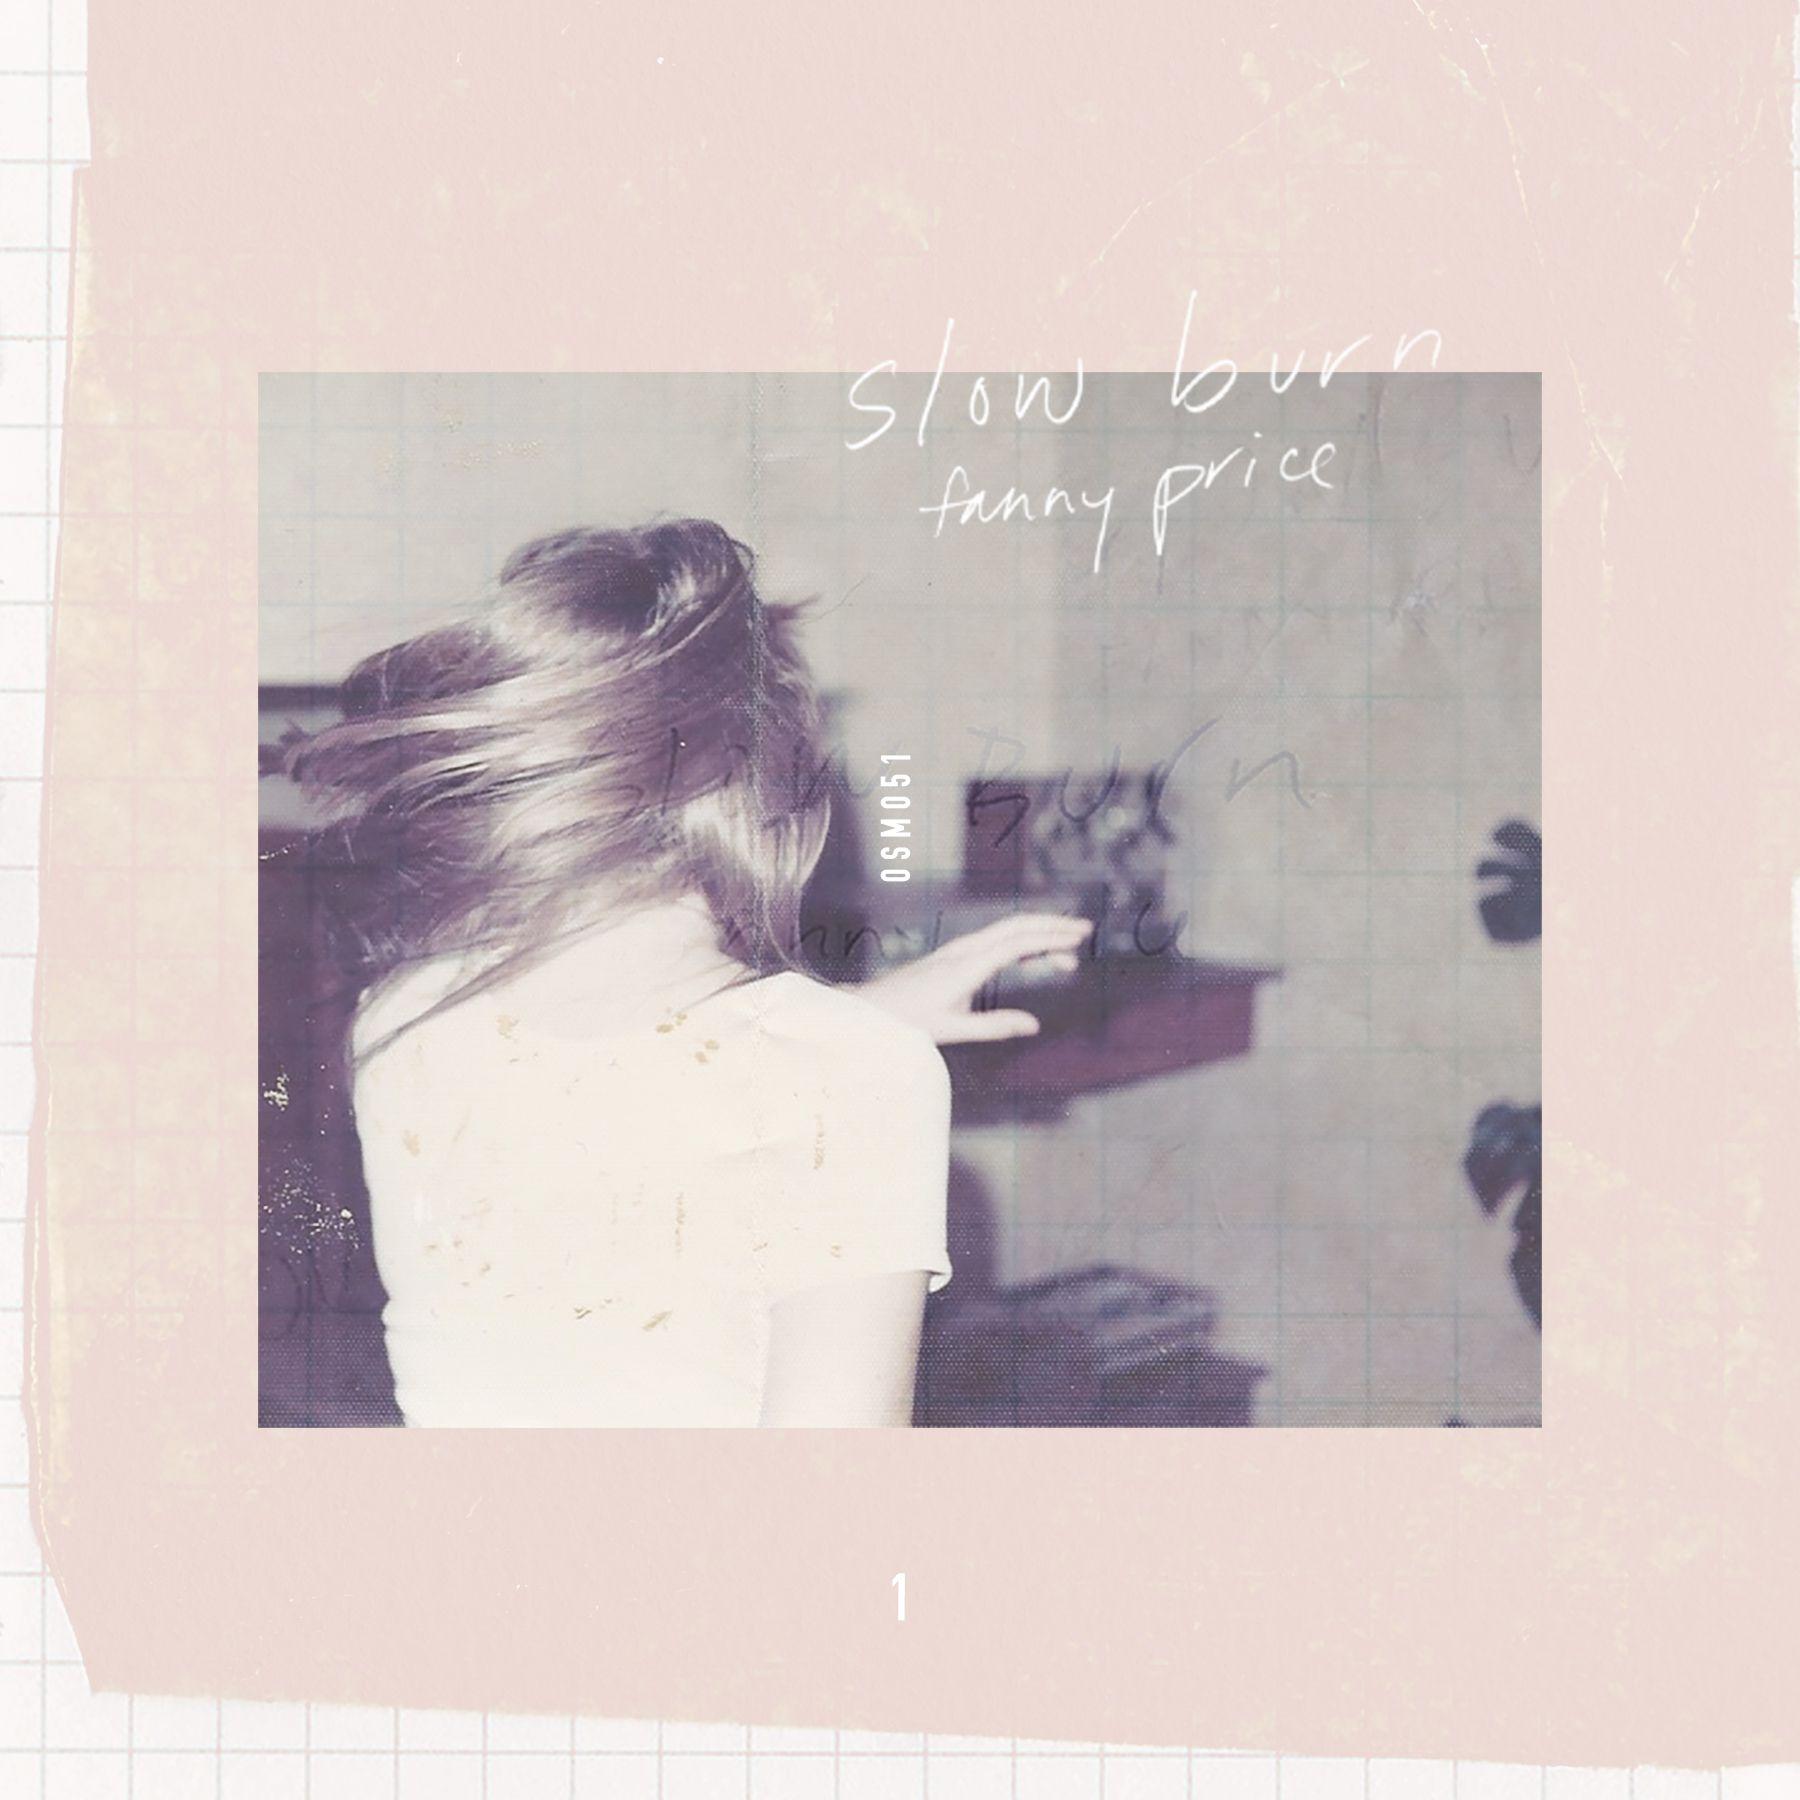 Fanny Price - Slow Burn